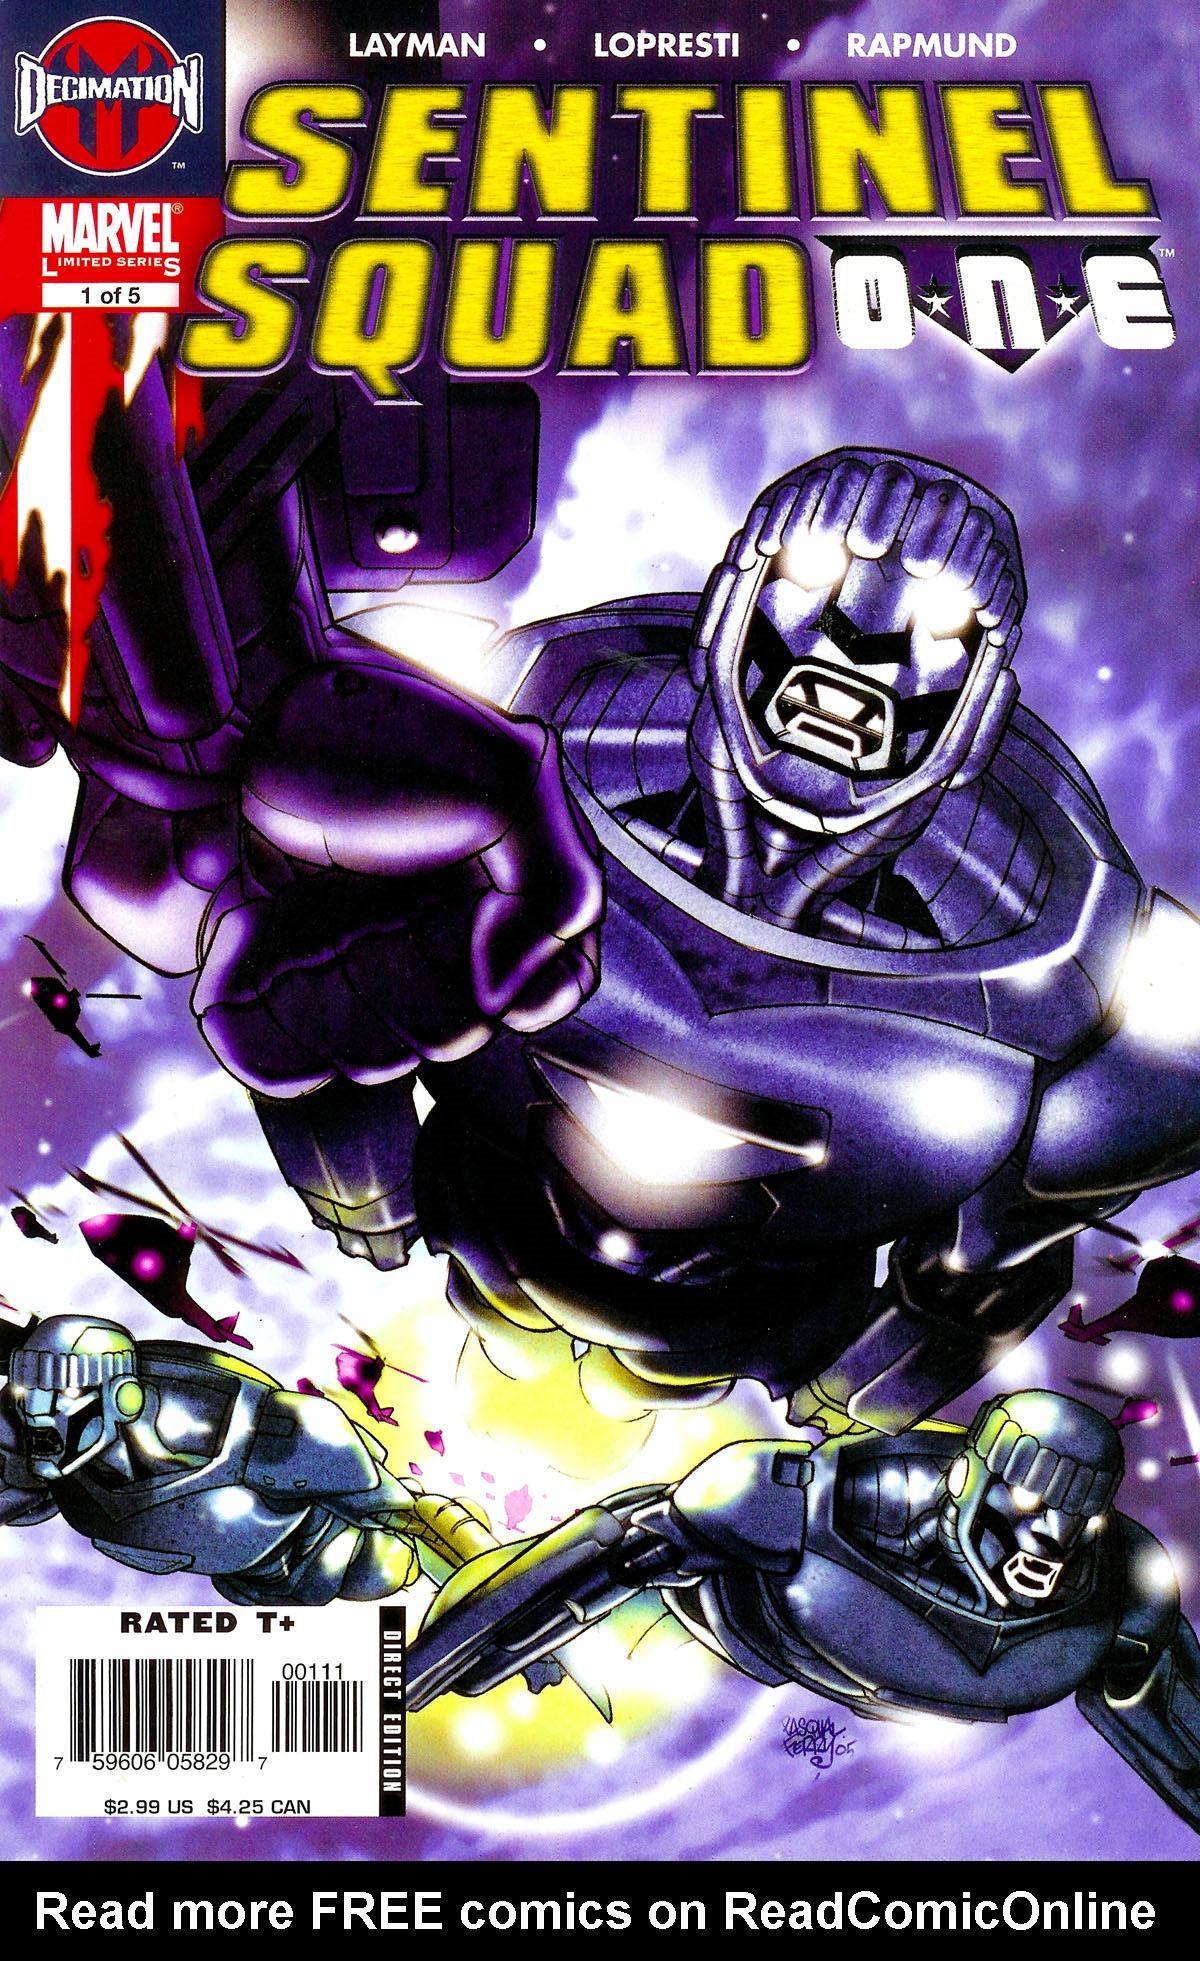 Read online Sentinel Squad O*N*E comic -  Issue #1 - 1